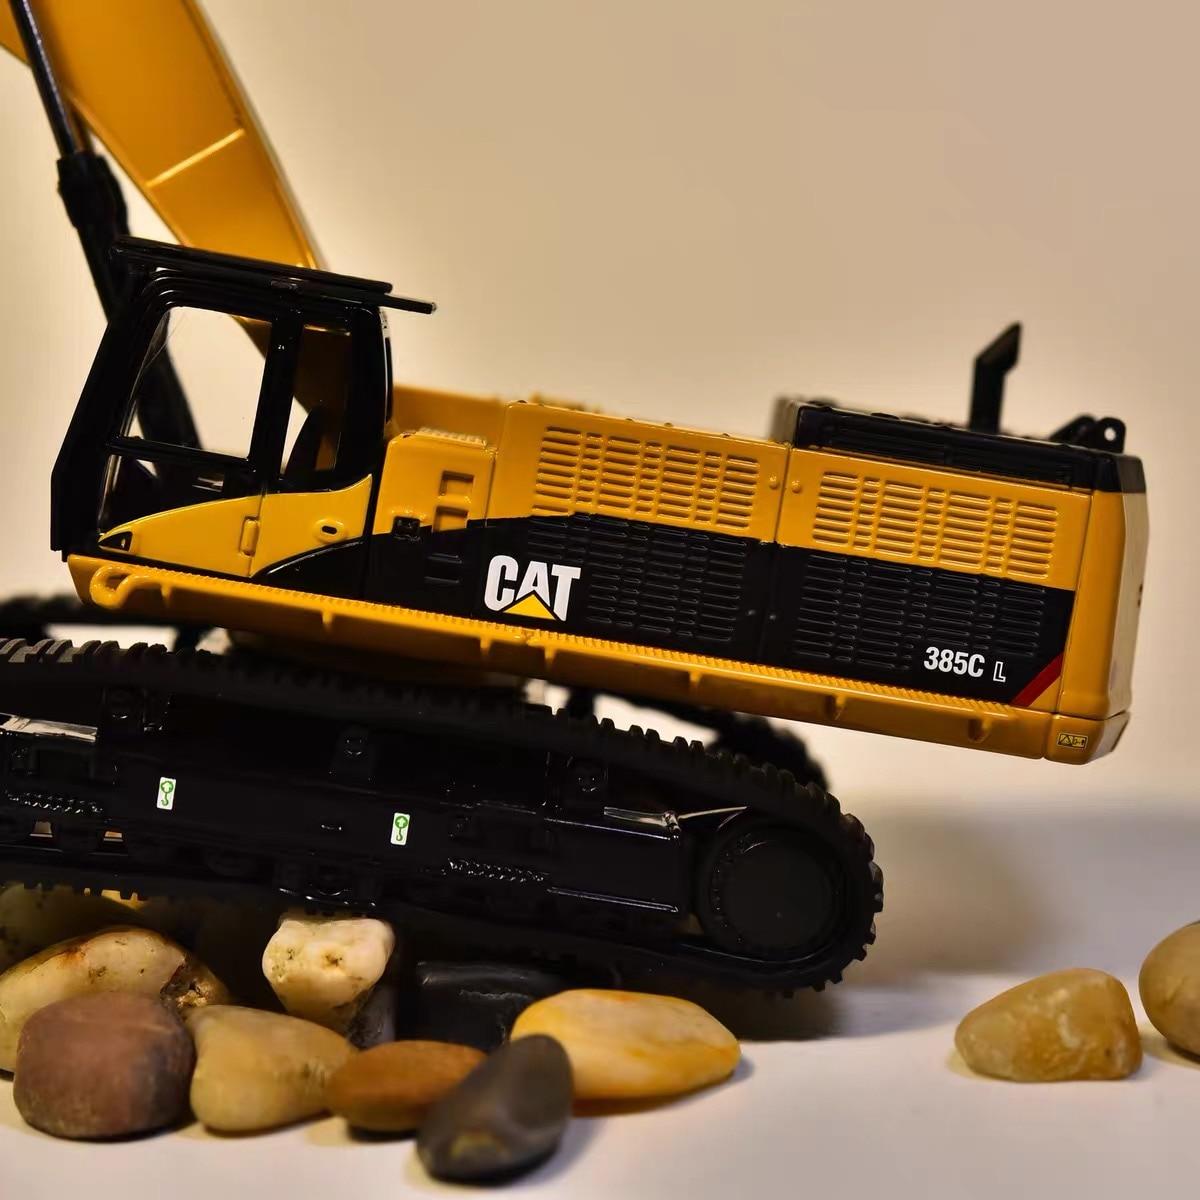 Lagartas 1:64 cat 385c matel escavadeira hidráulica